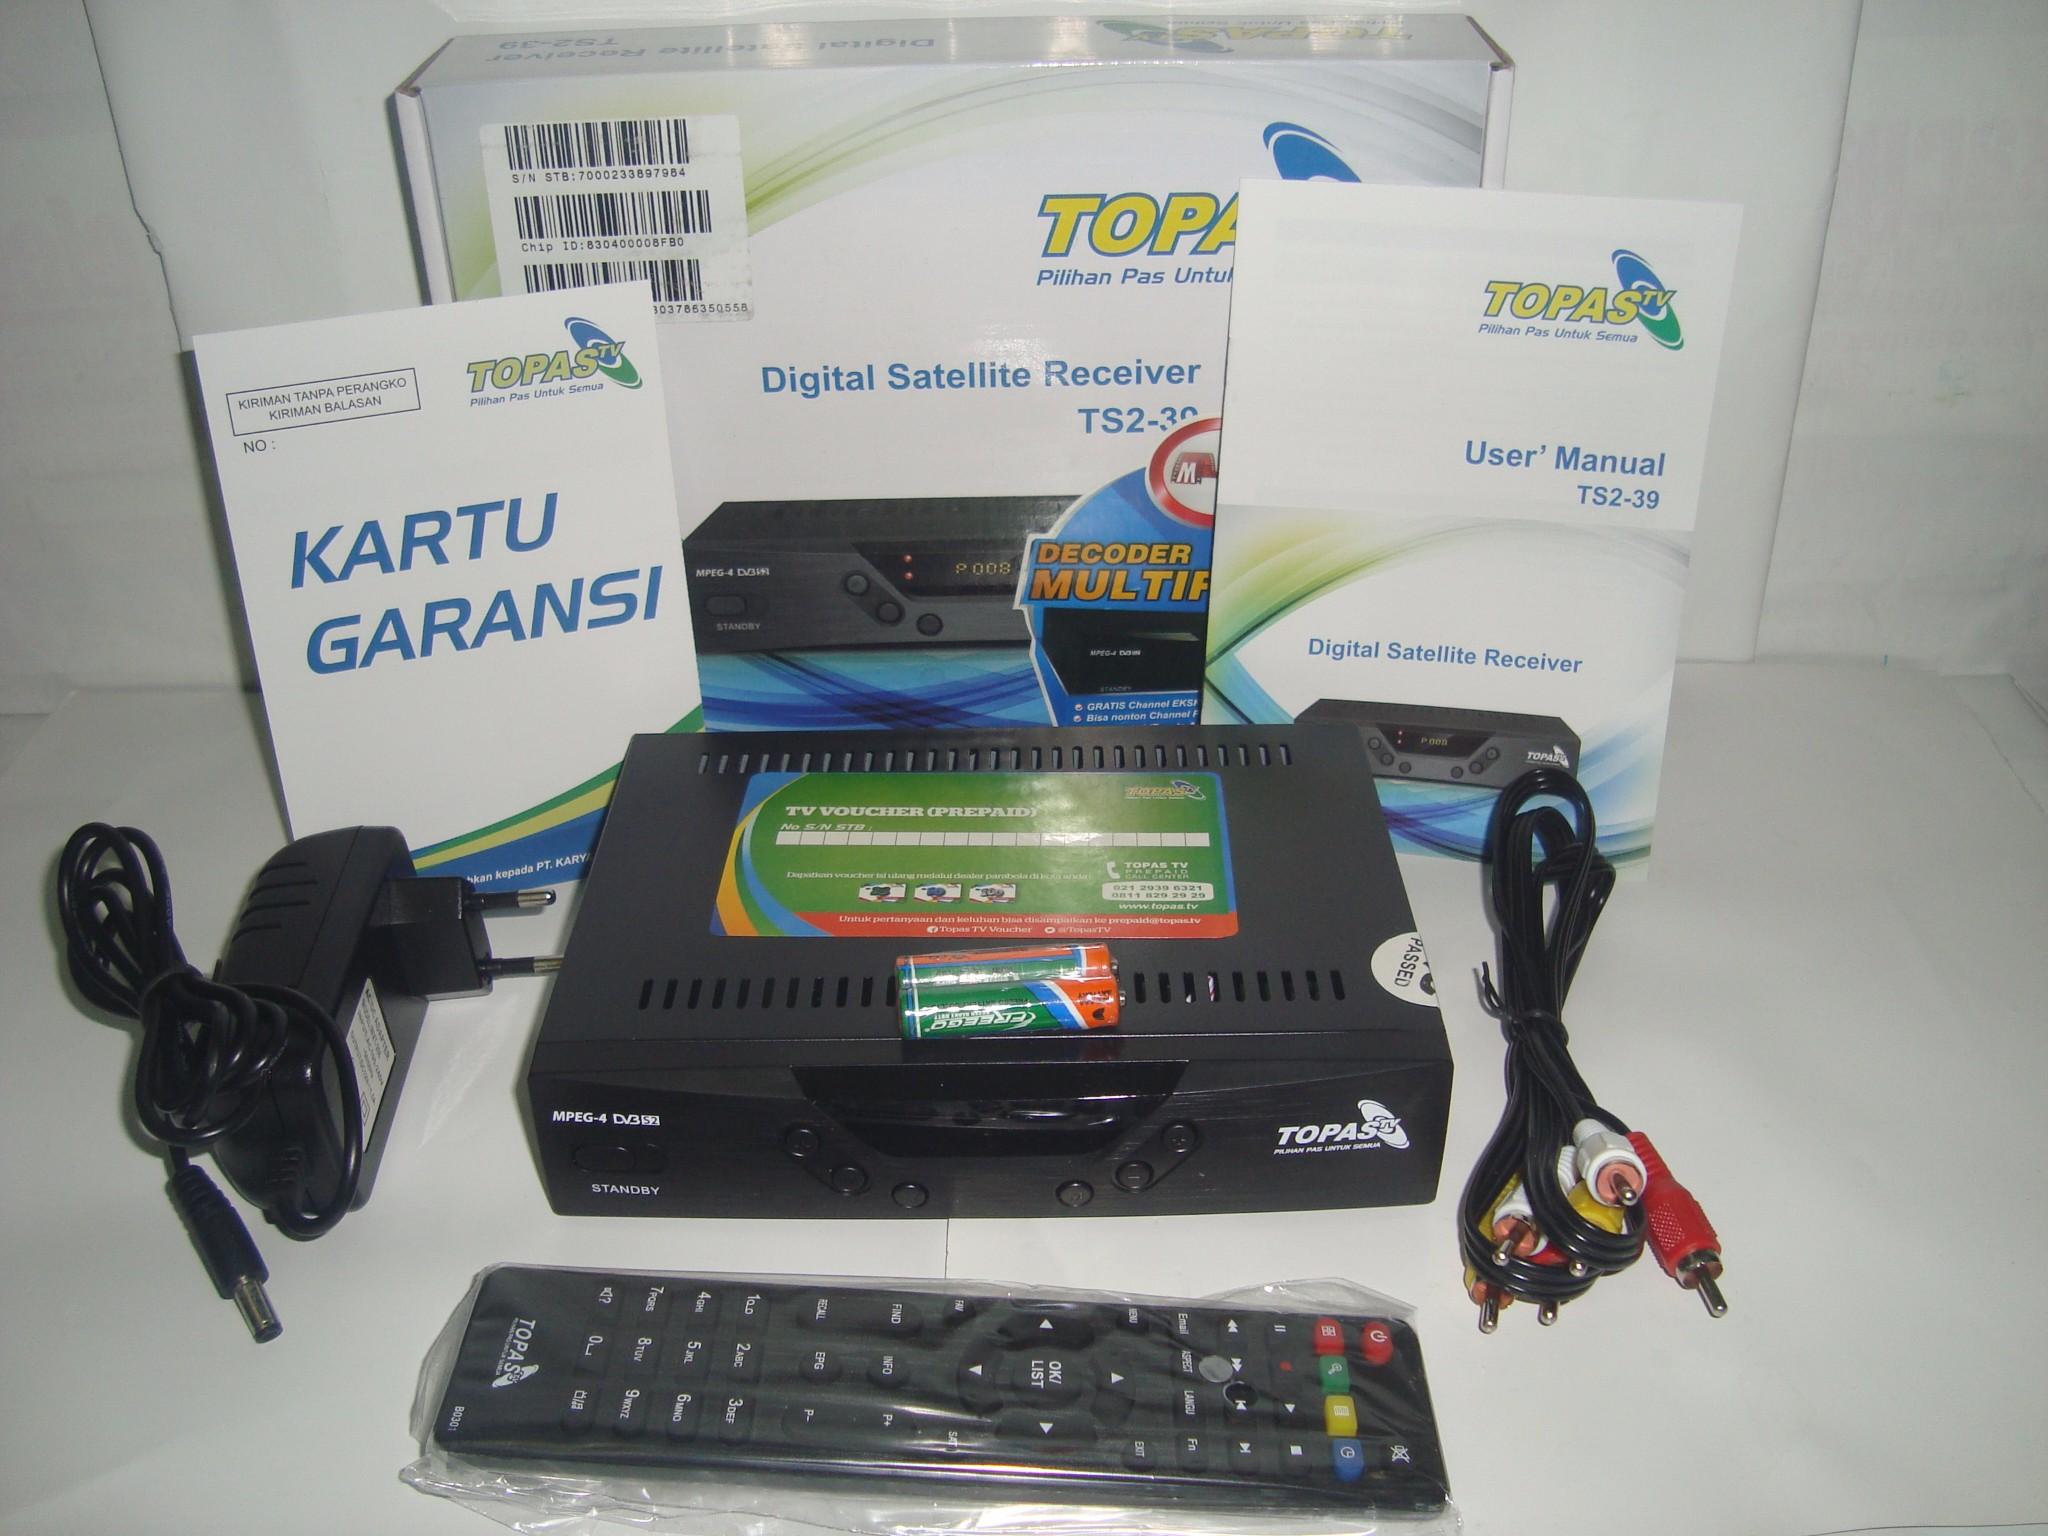 Jual Receiver Parabola Topas Tv Free All Channel Premium Selama 2 Voucher Topastv Paket Basic 1 Tahun Ht Elektro Store Tokopedia